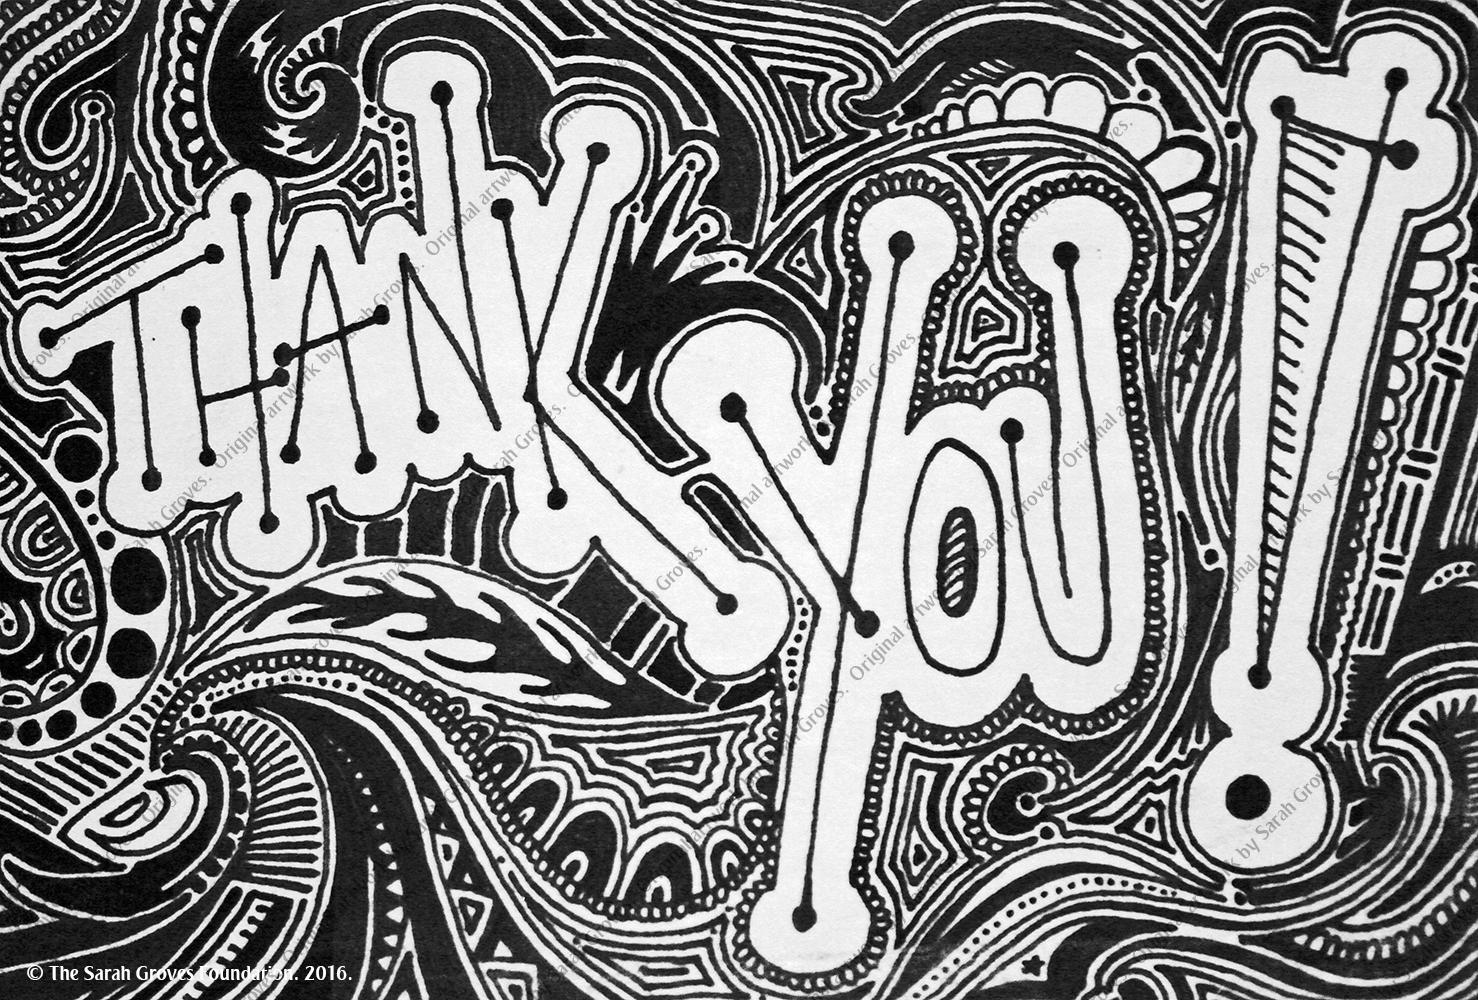 16 Thank You - watermark.jpg